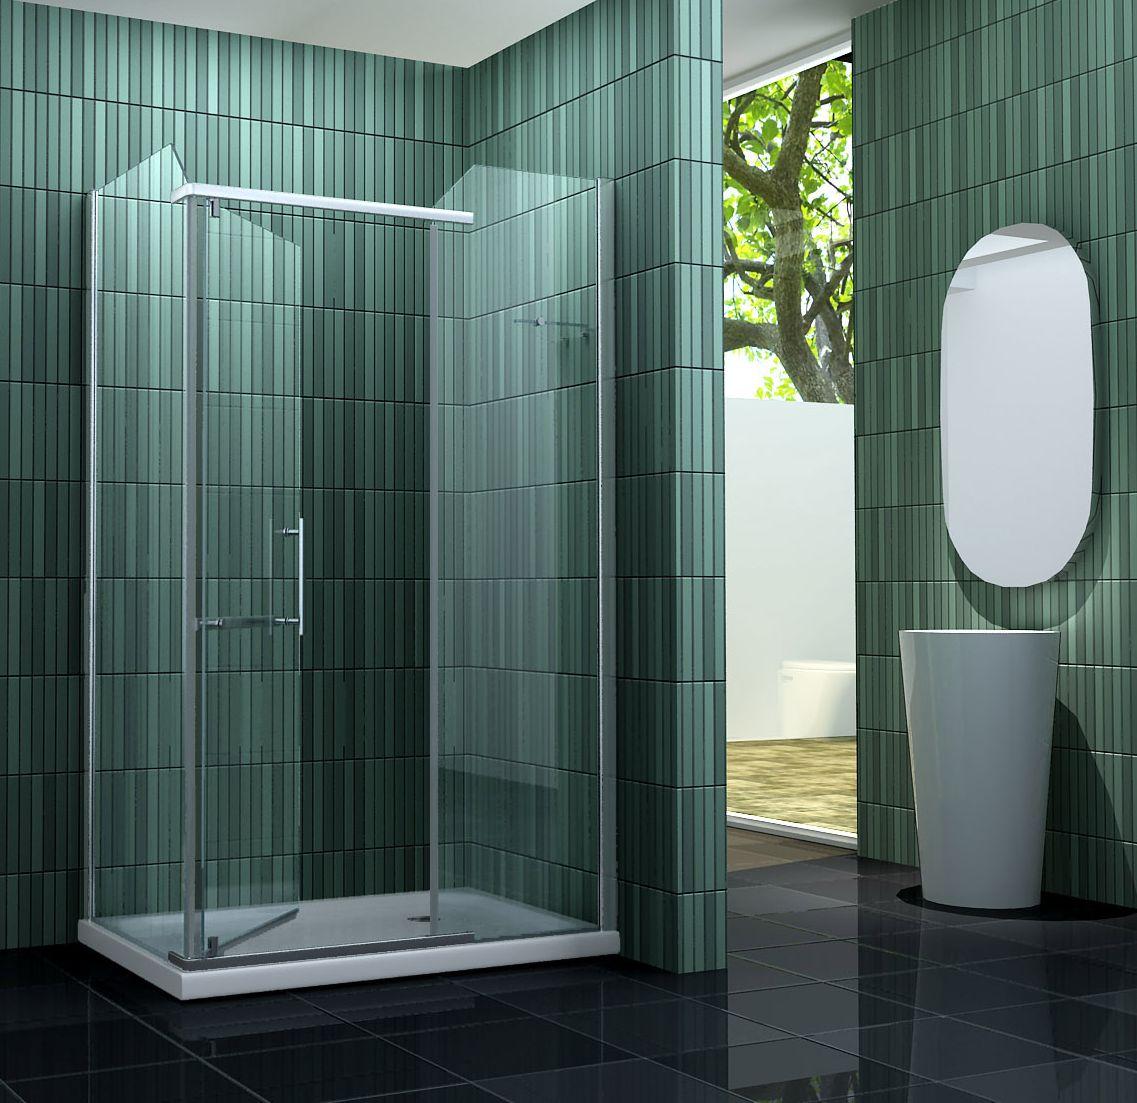 duschkabine enco 120 x 80 cm inkl duschtasse. Black Bedroom Furniture Sets. Home Design Ideas